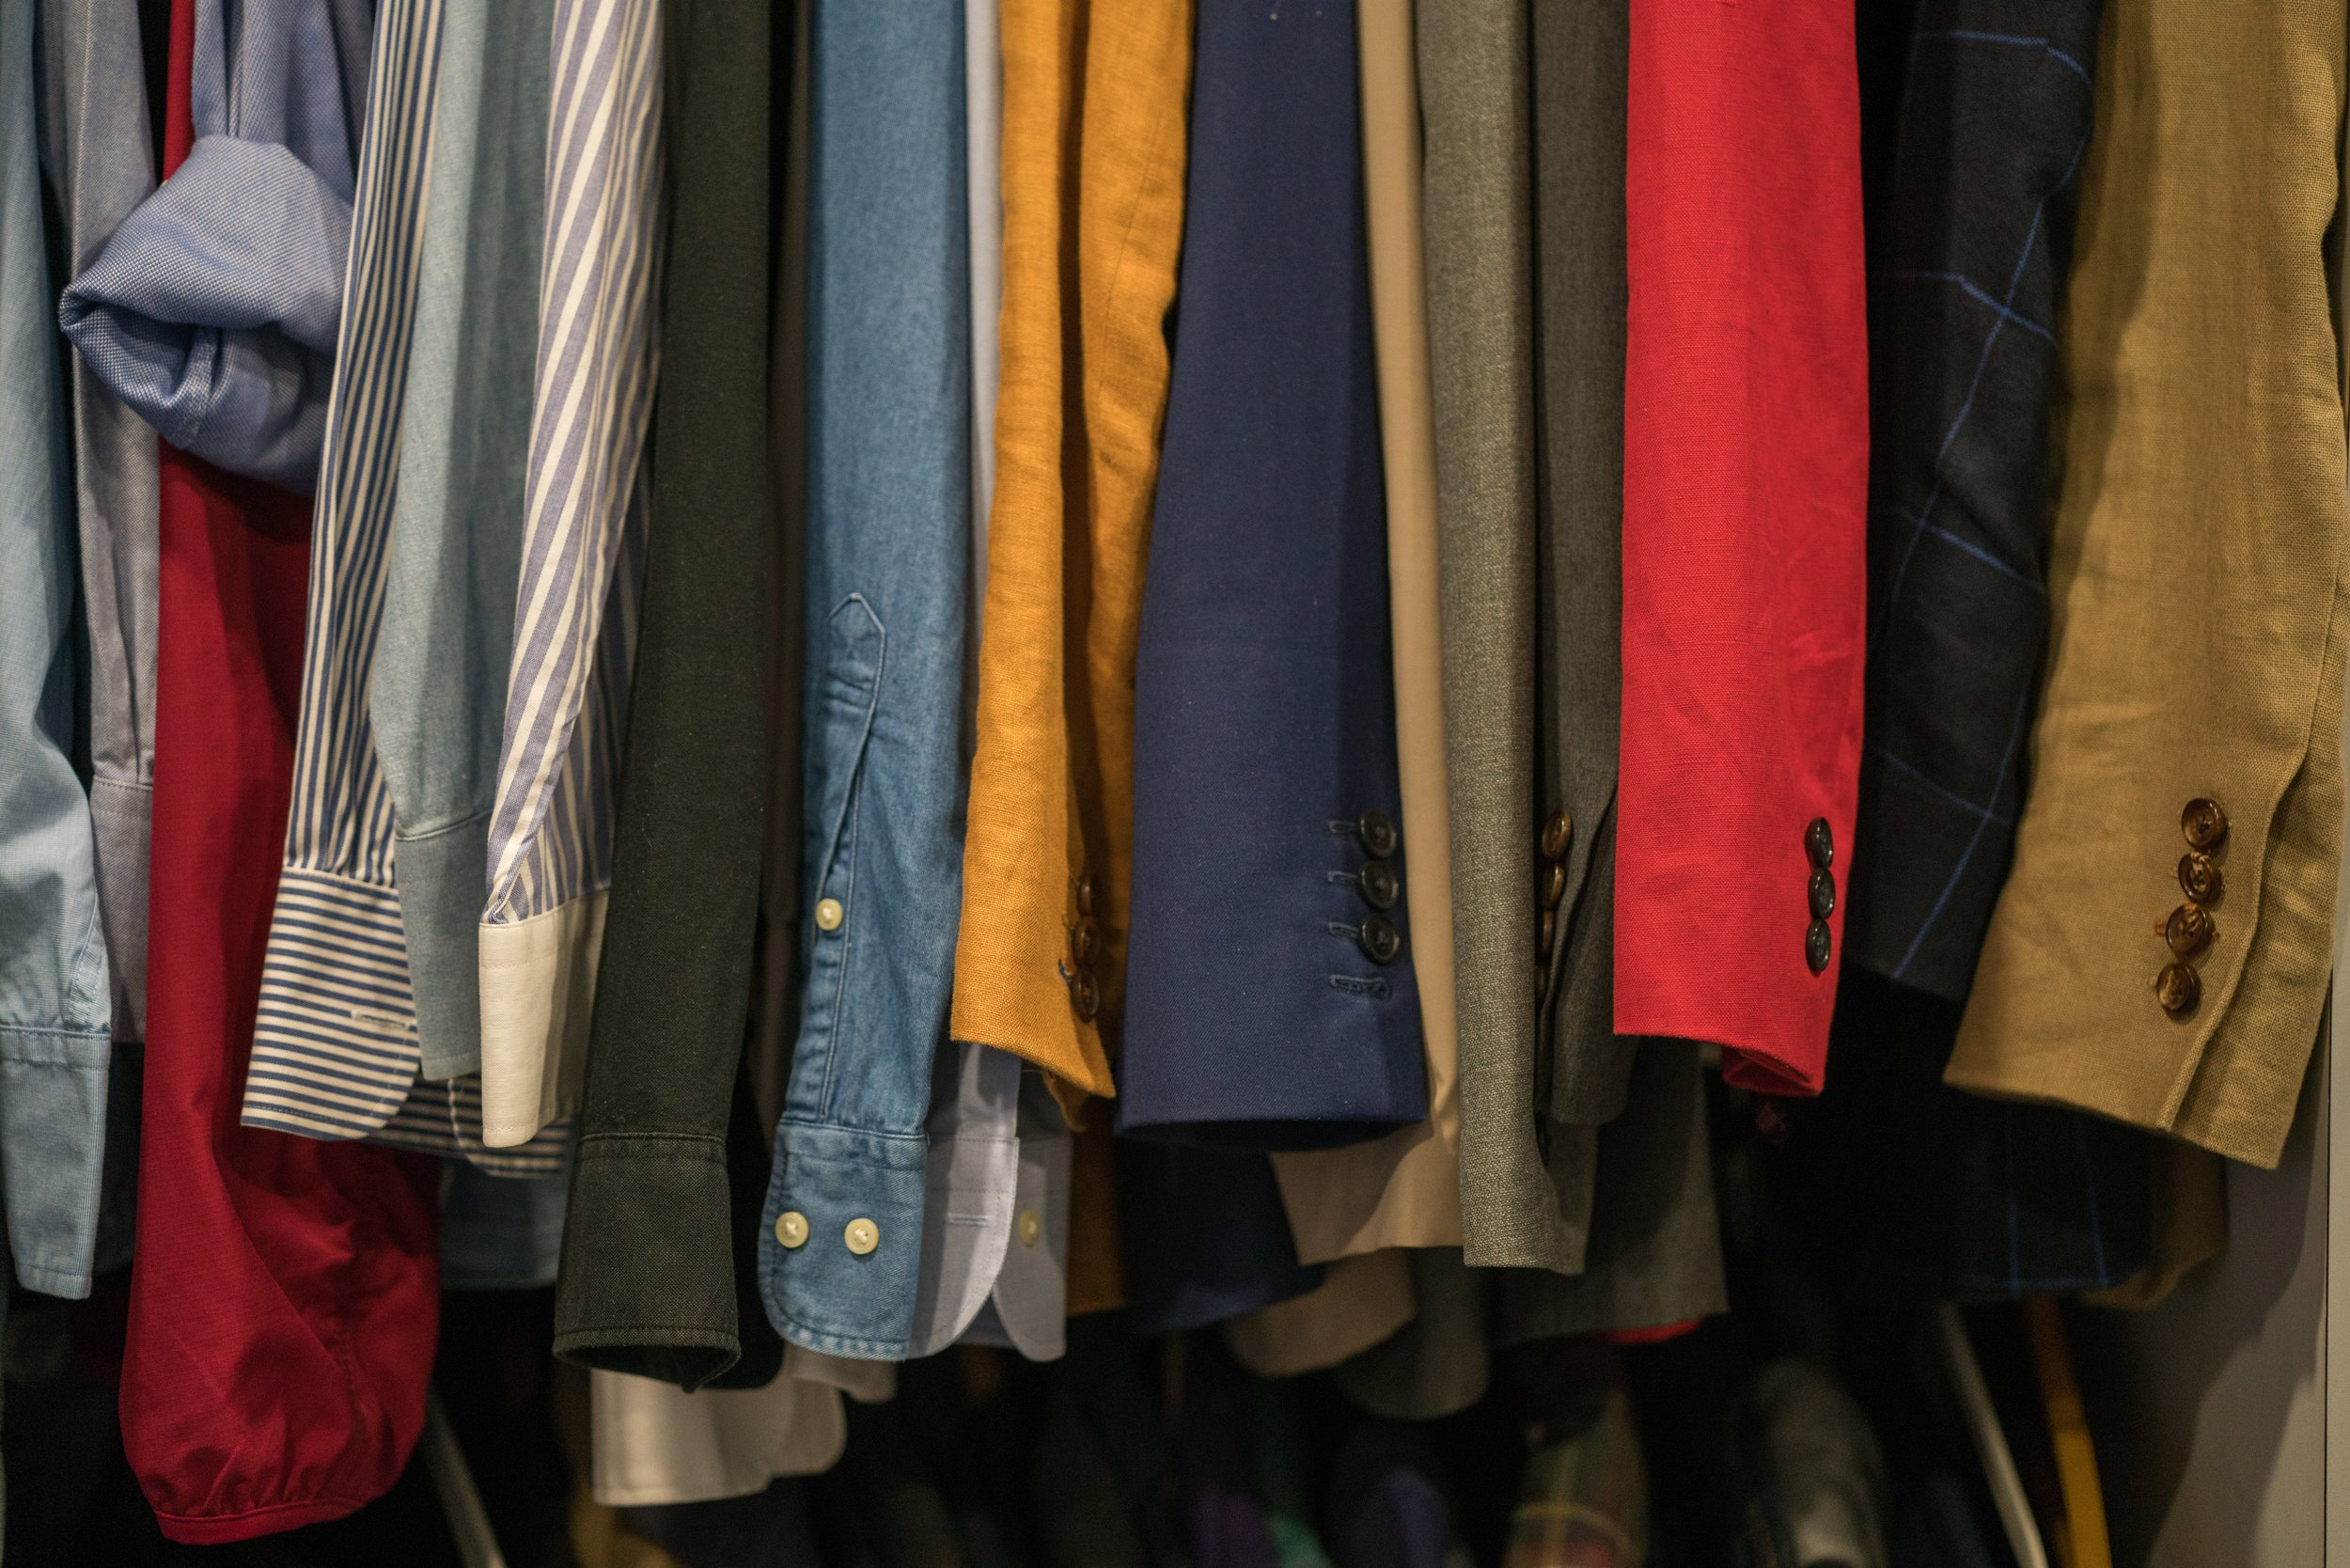 apparel-assortment-boutique-1336873.jpg